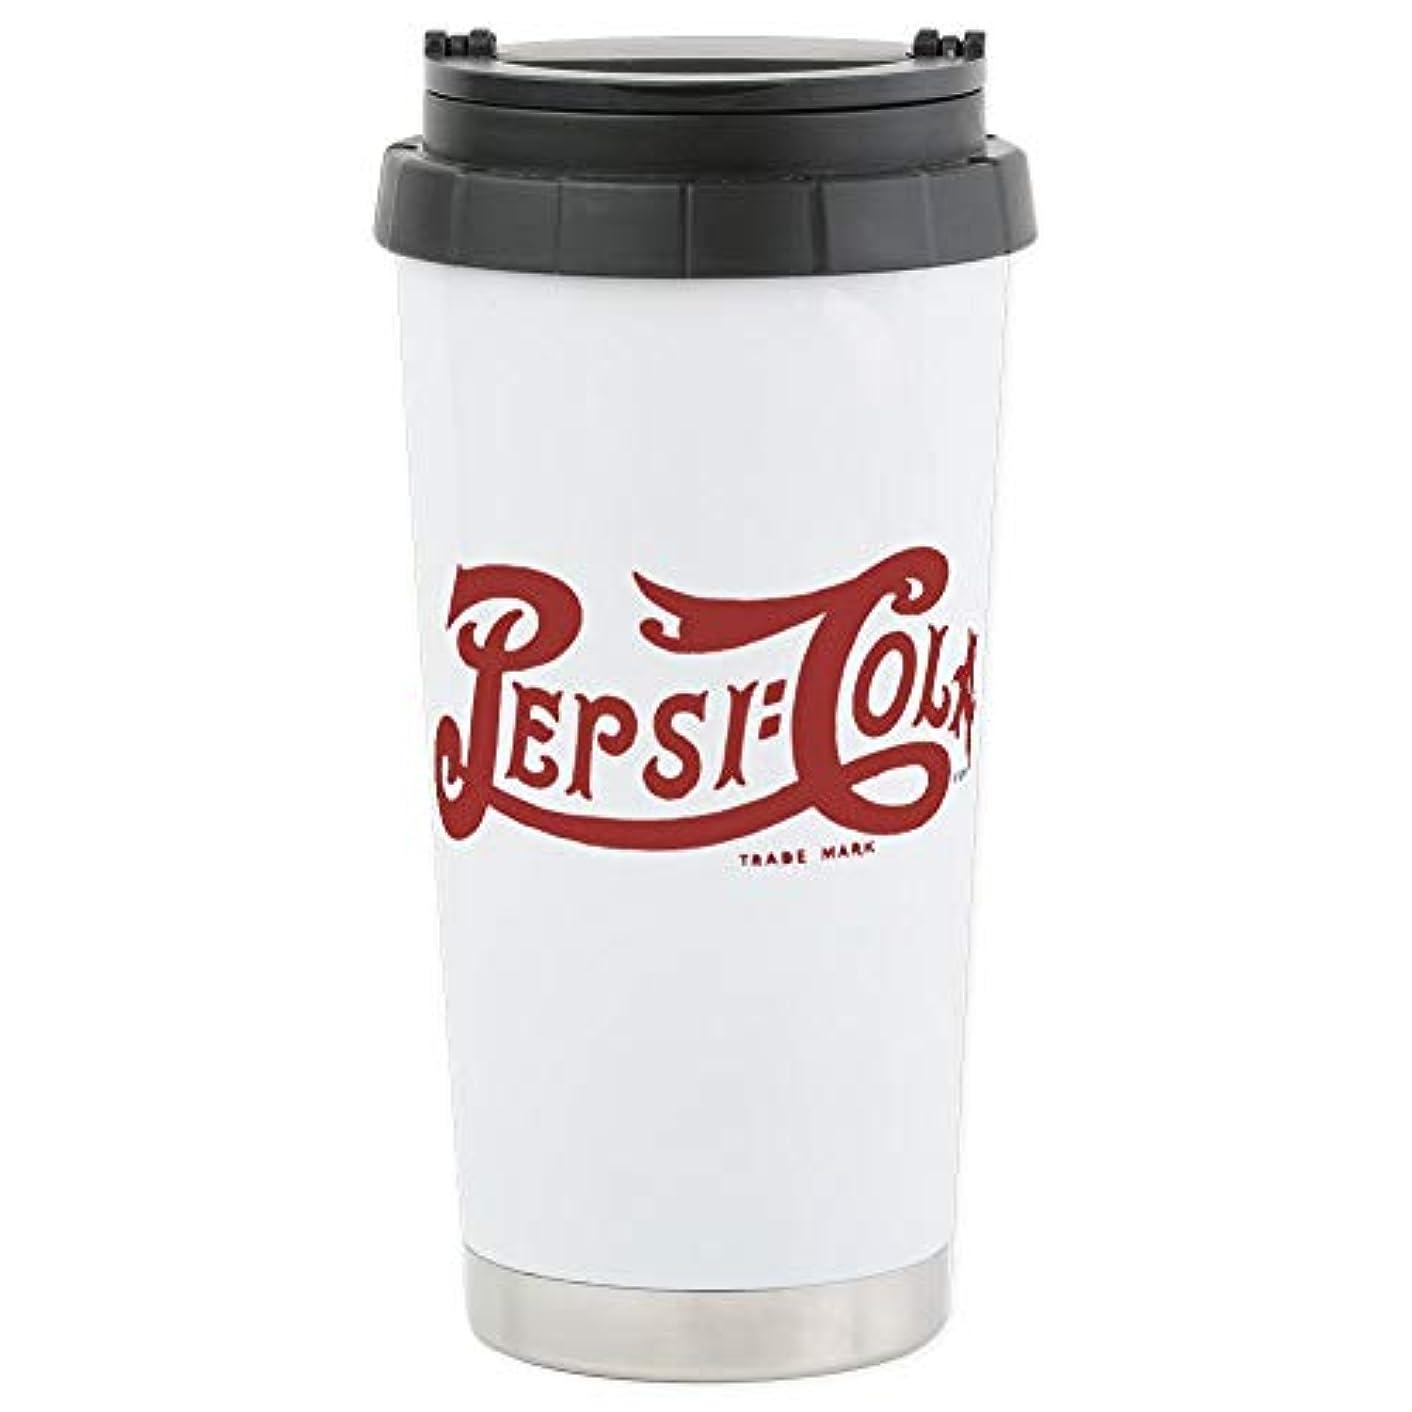 CafePress Pepsi Mugs Stainless Steel Travel Mug, Insulated 16 oz. Coffee Tumbler